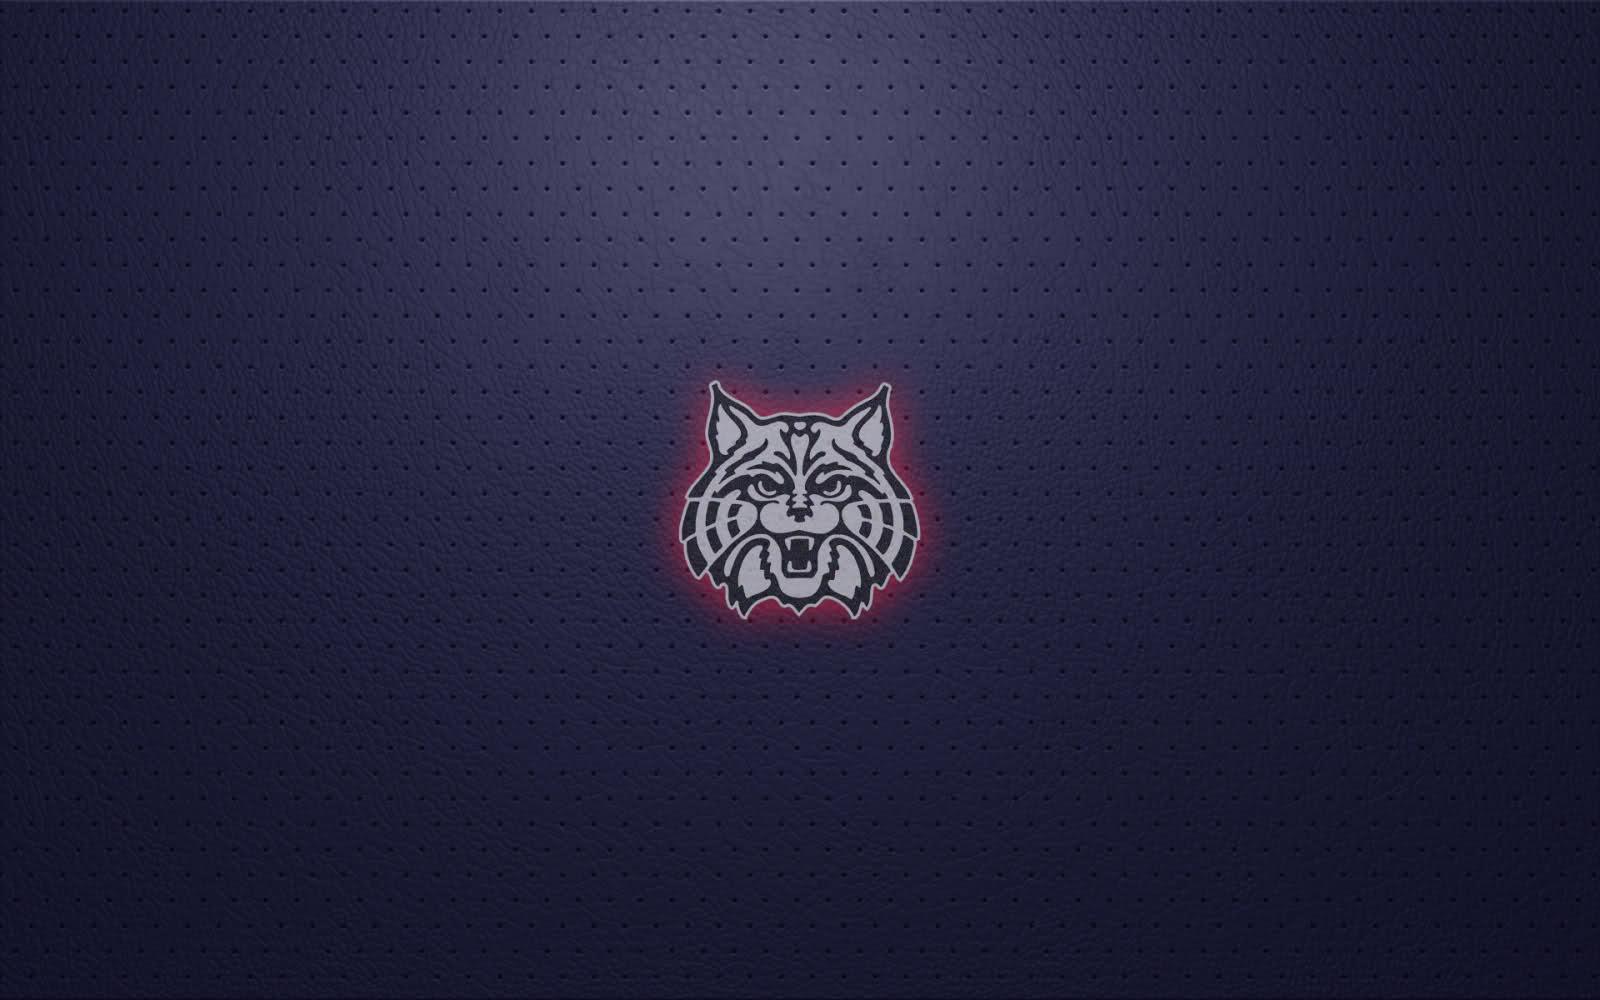 University of Arizona Wildcats Wallpaper 1600x1000